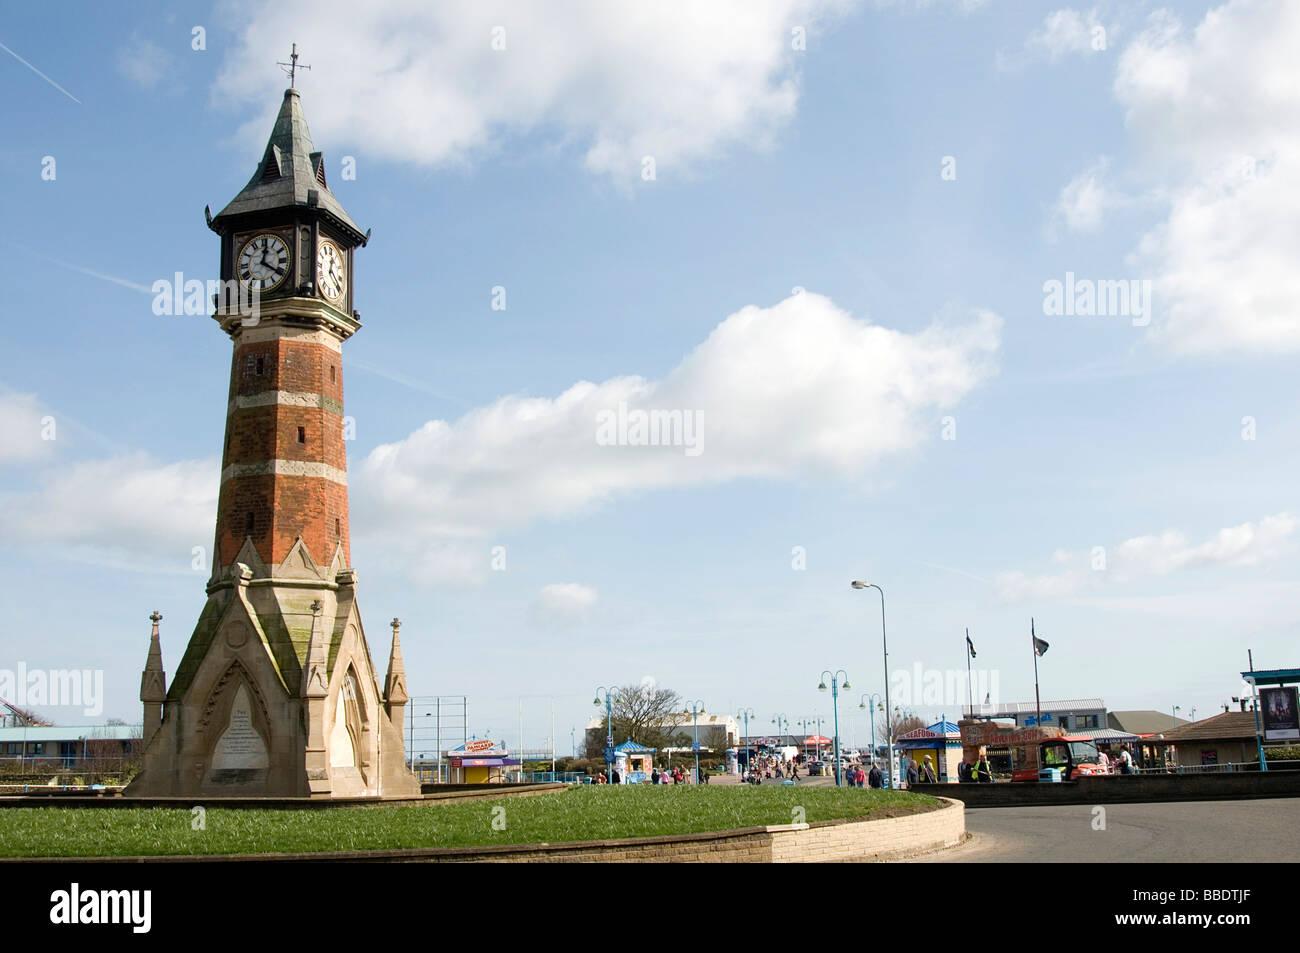 skegness linconshire coast seaside resort uk england english clocktower clock tower town centre center - Stock Image